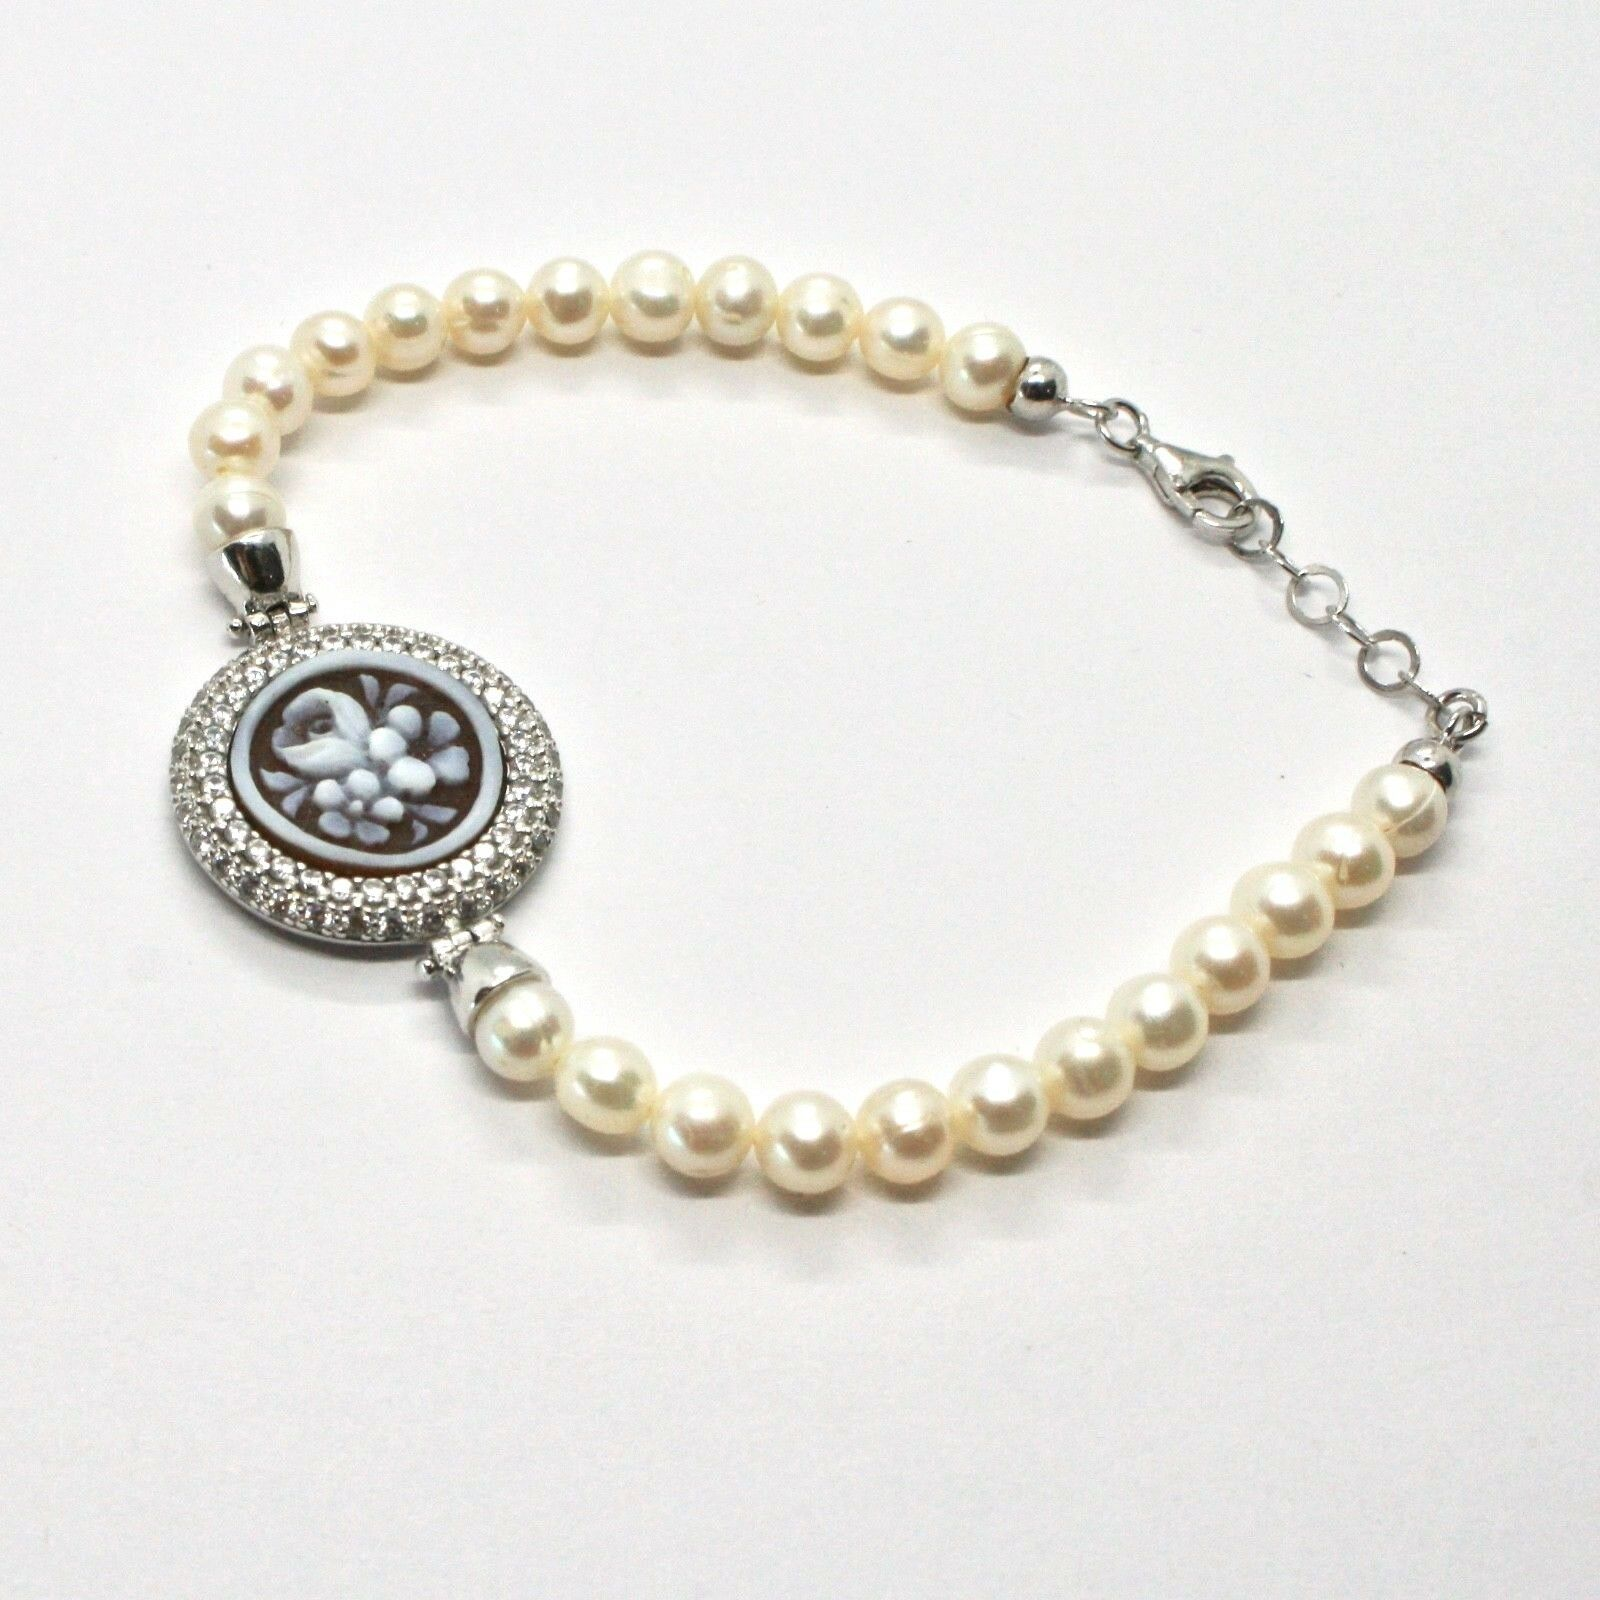 Pulsera de Plata 925 con Perlas de Agua Dulce Camafeo Camafeo Zirconia Cúbicos